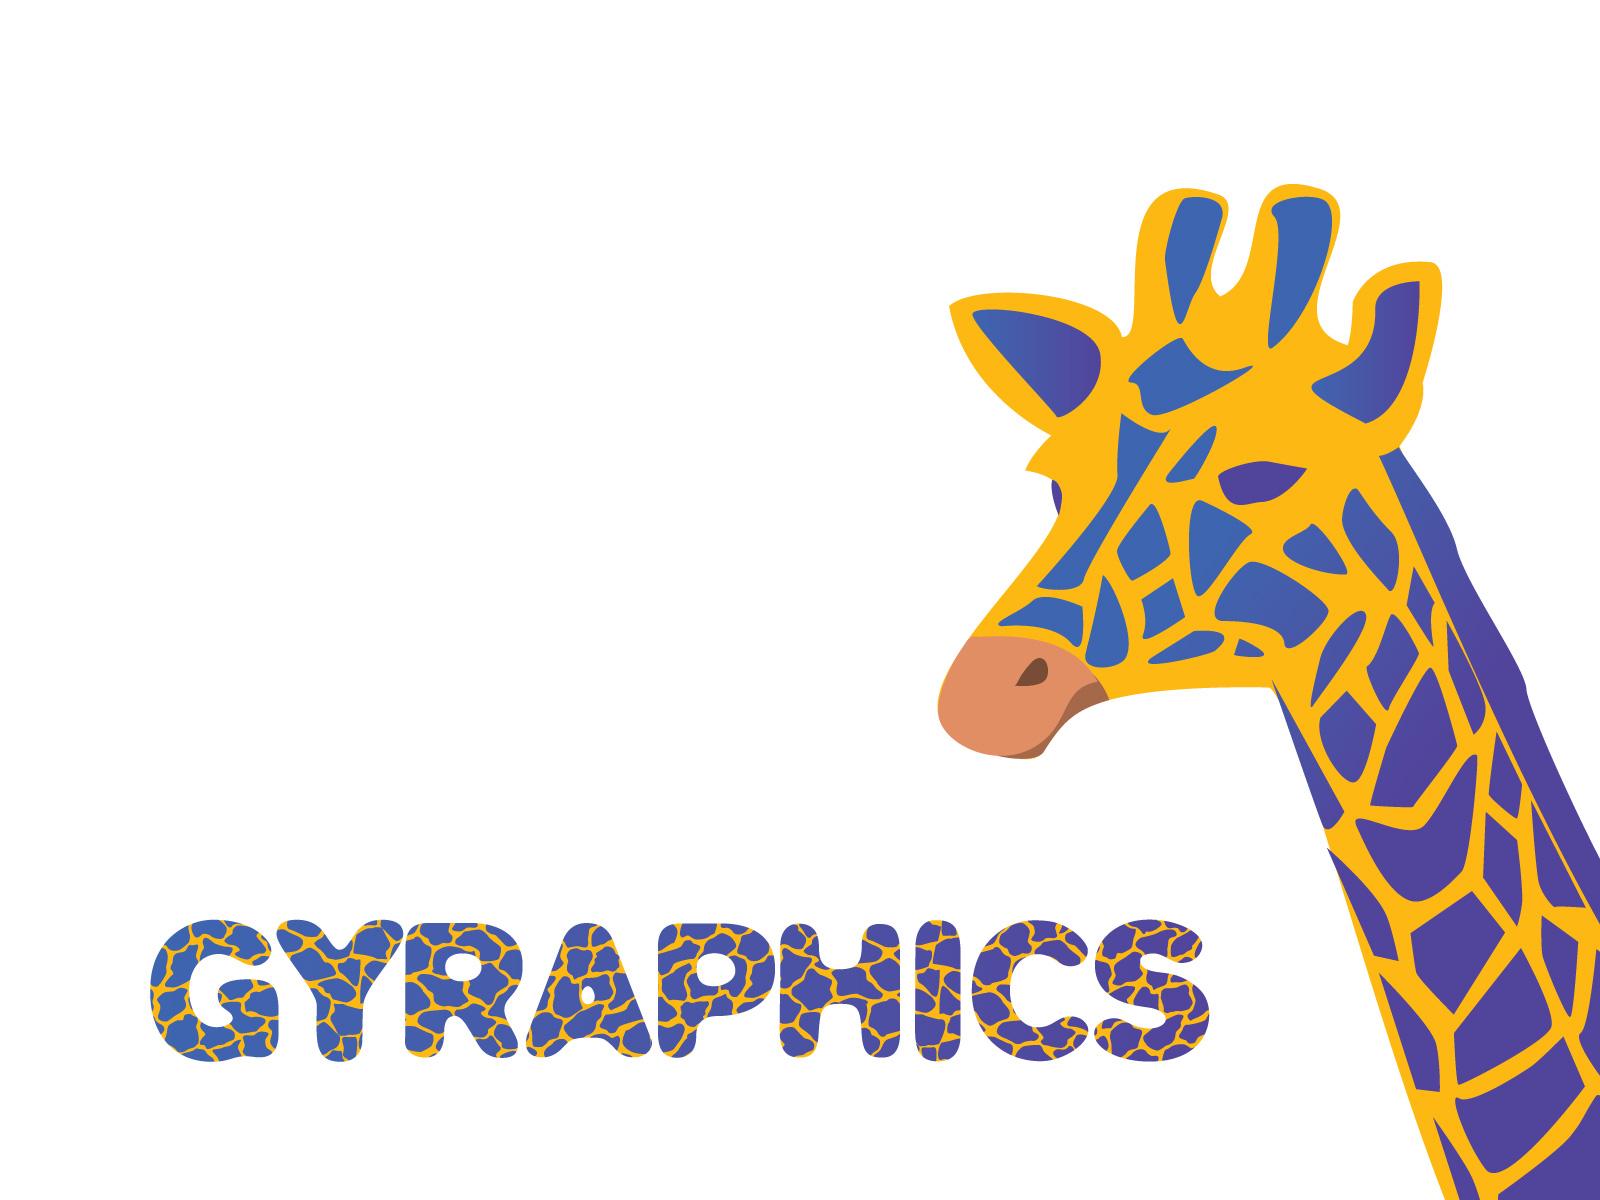 gyraphics logo